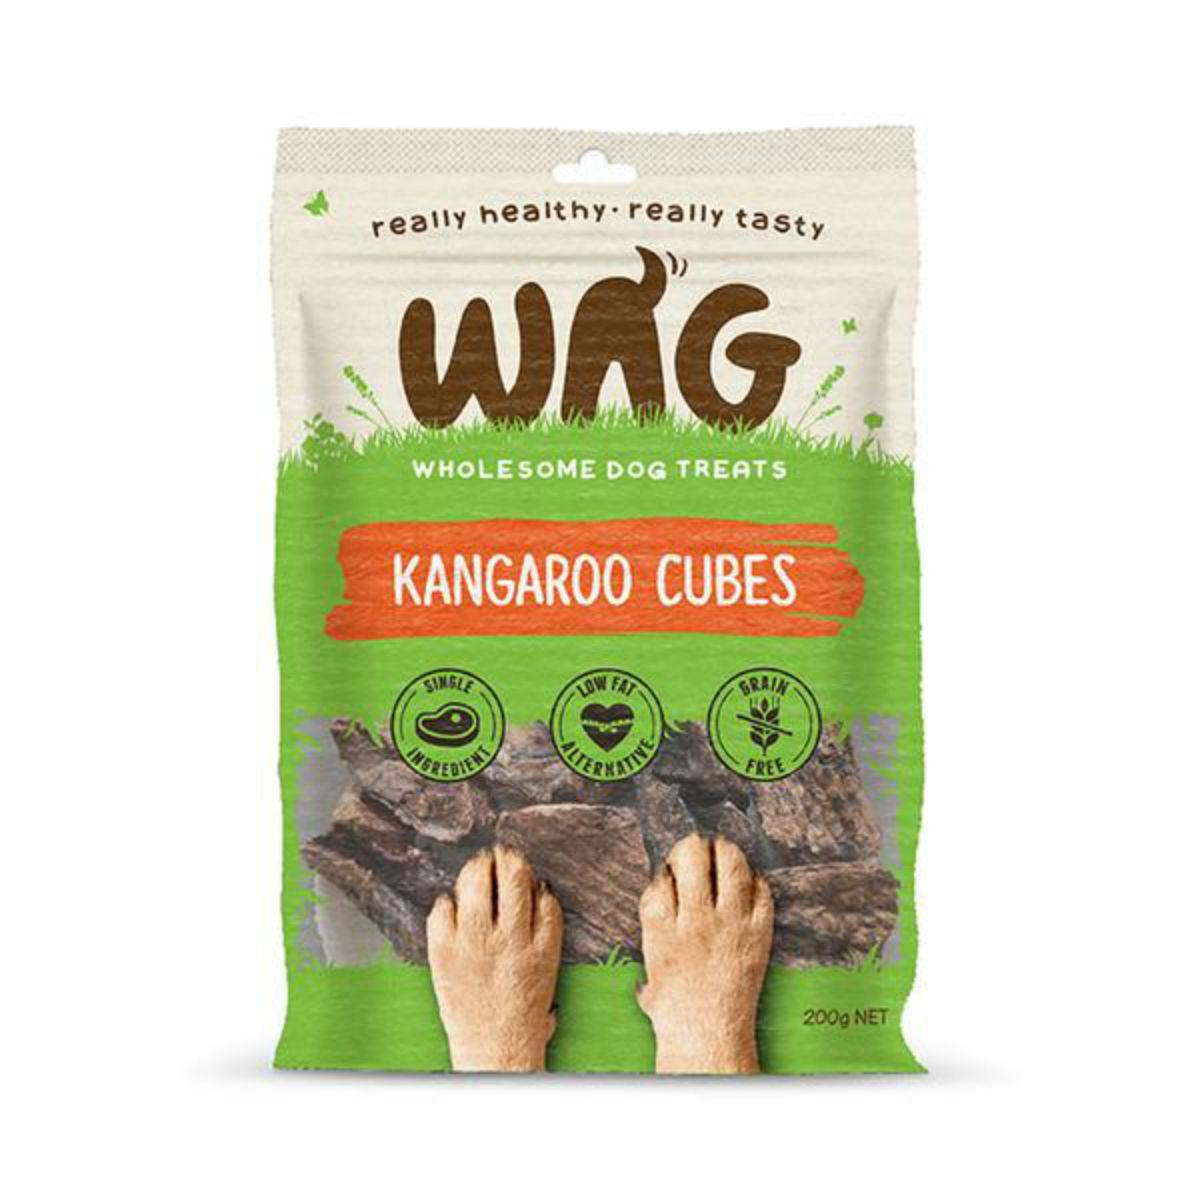 WAG Kangaroo Cubes Dog Jerky Treats